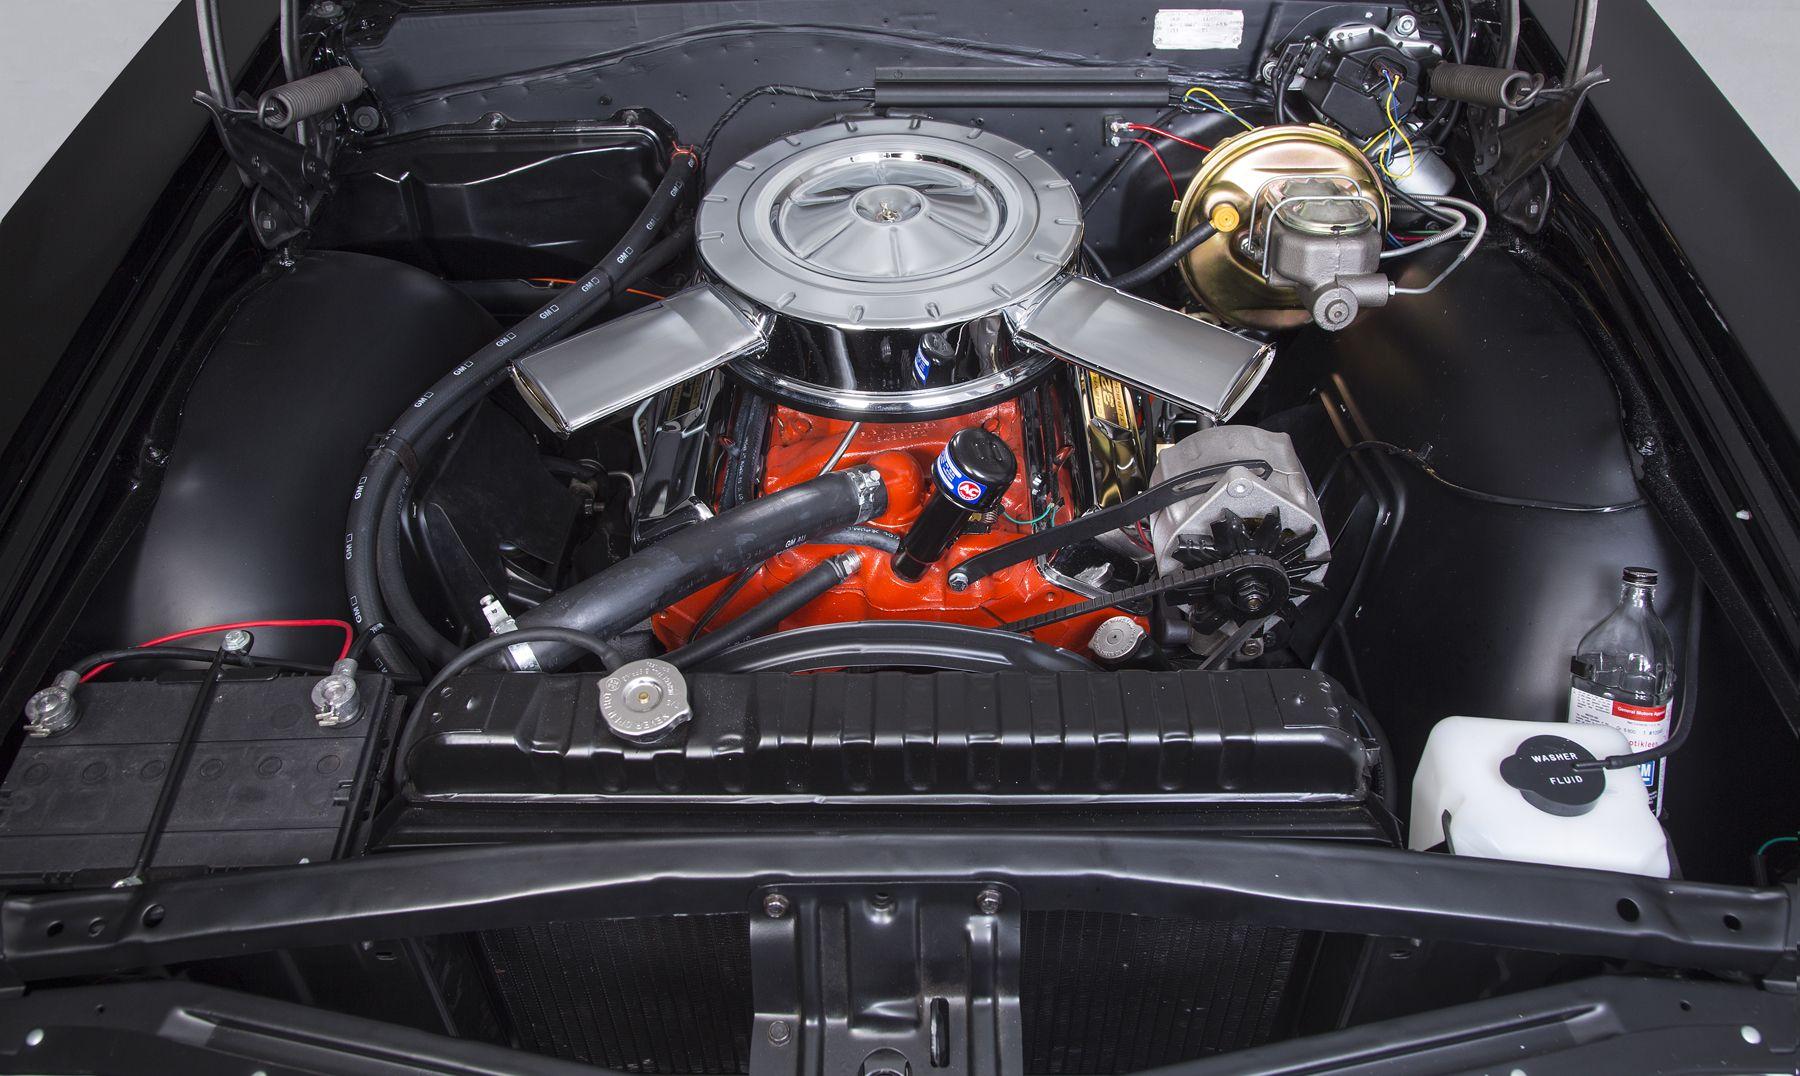 65 chevelle engine 307/327/350 SBC Build Pinterest